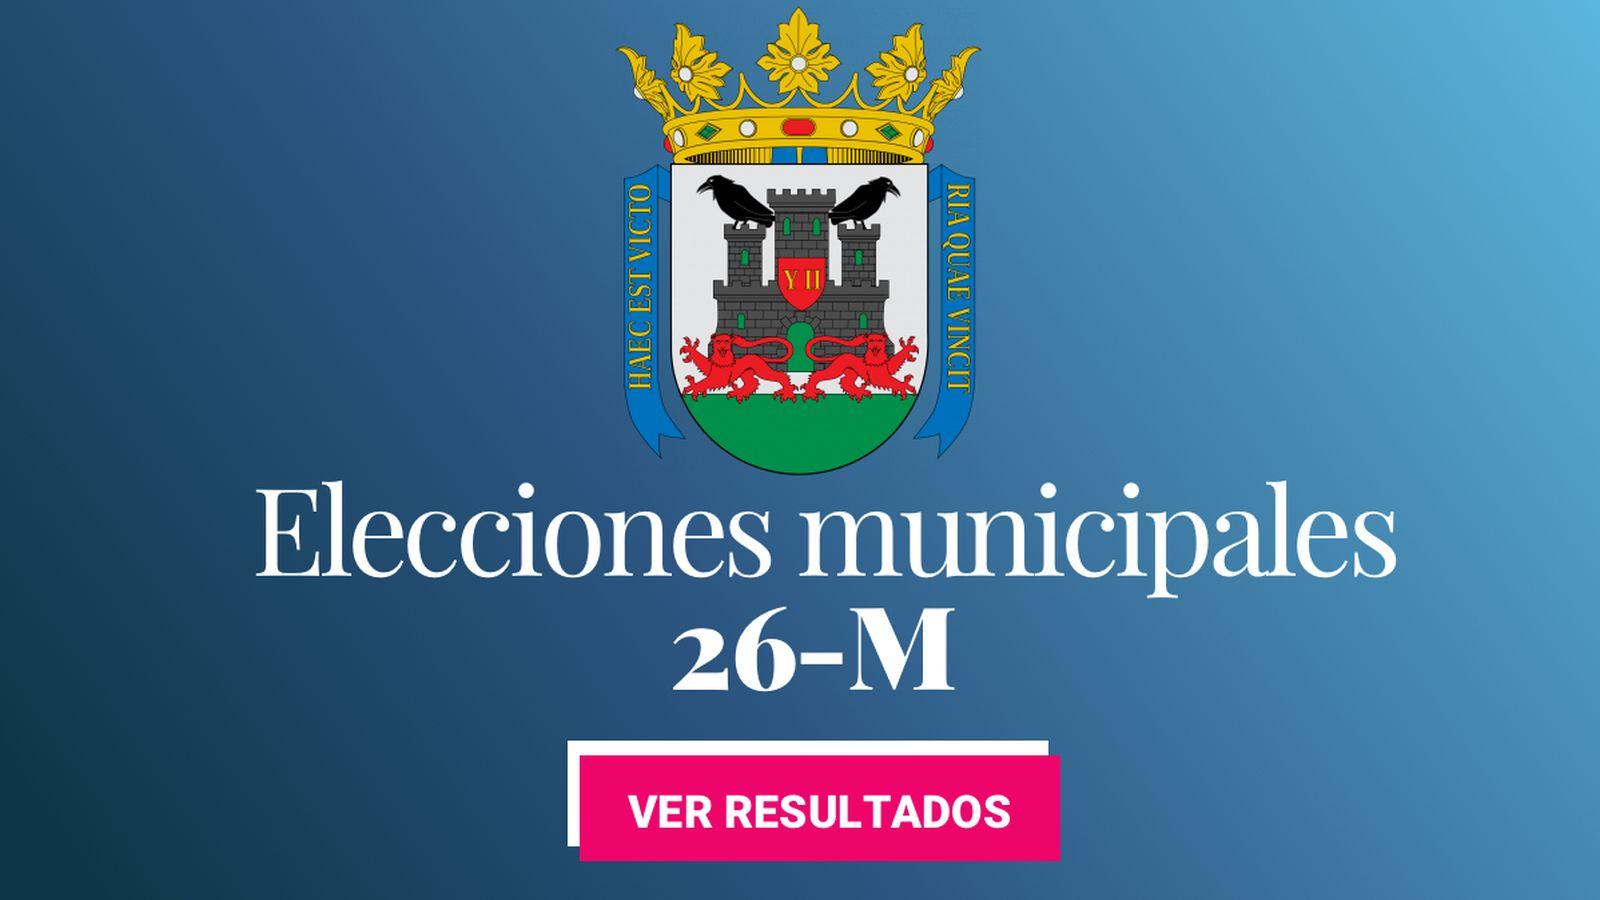 Foto: Elecciones municipales 2019 en Vitoria-Gasteiz. (C.C./EC)